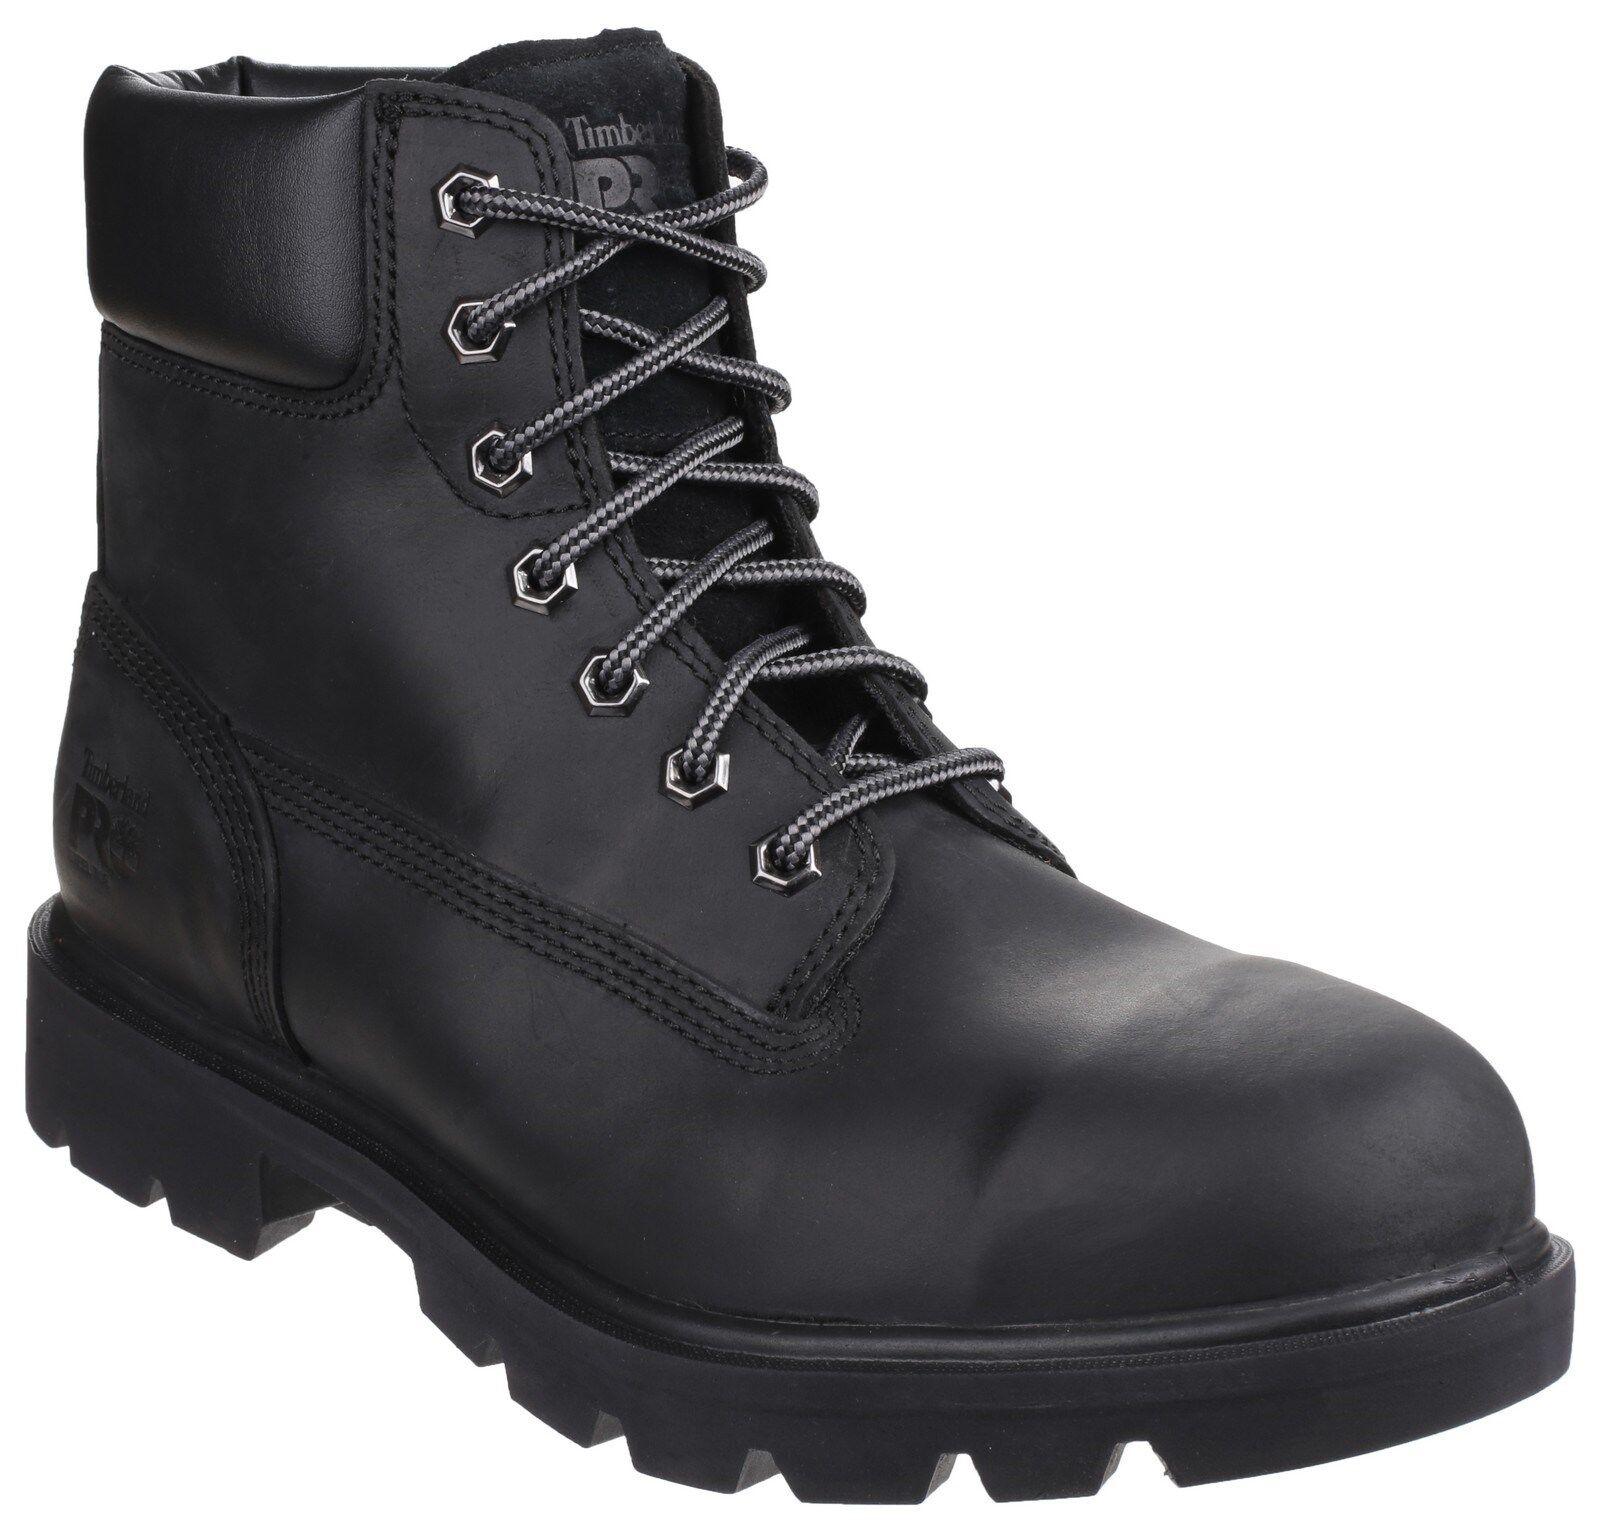 PUMA XO parallelo Tactical 46 Boots Uomo TG 46 Tactical Pelle Nera Alta Scarpe Sneaker bfea5d